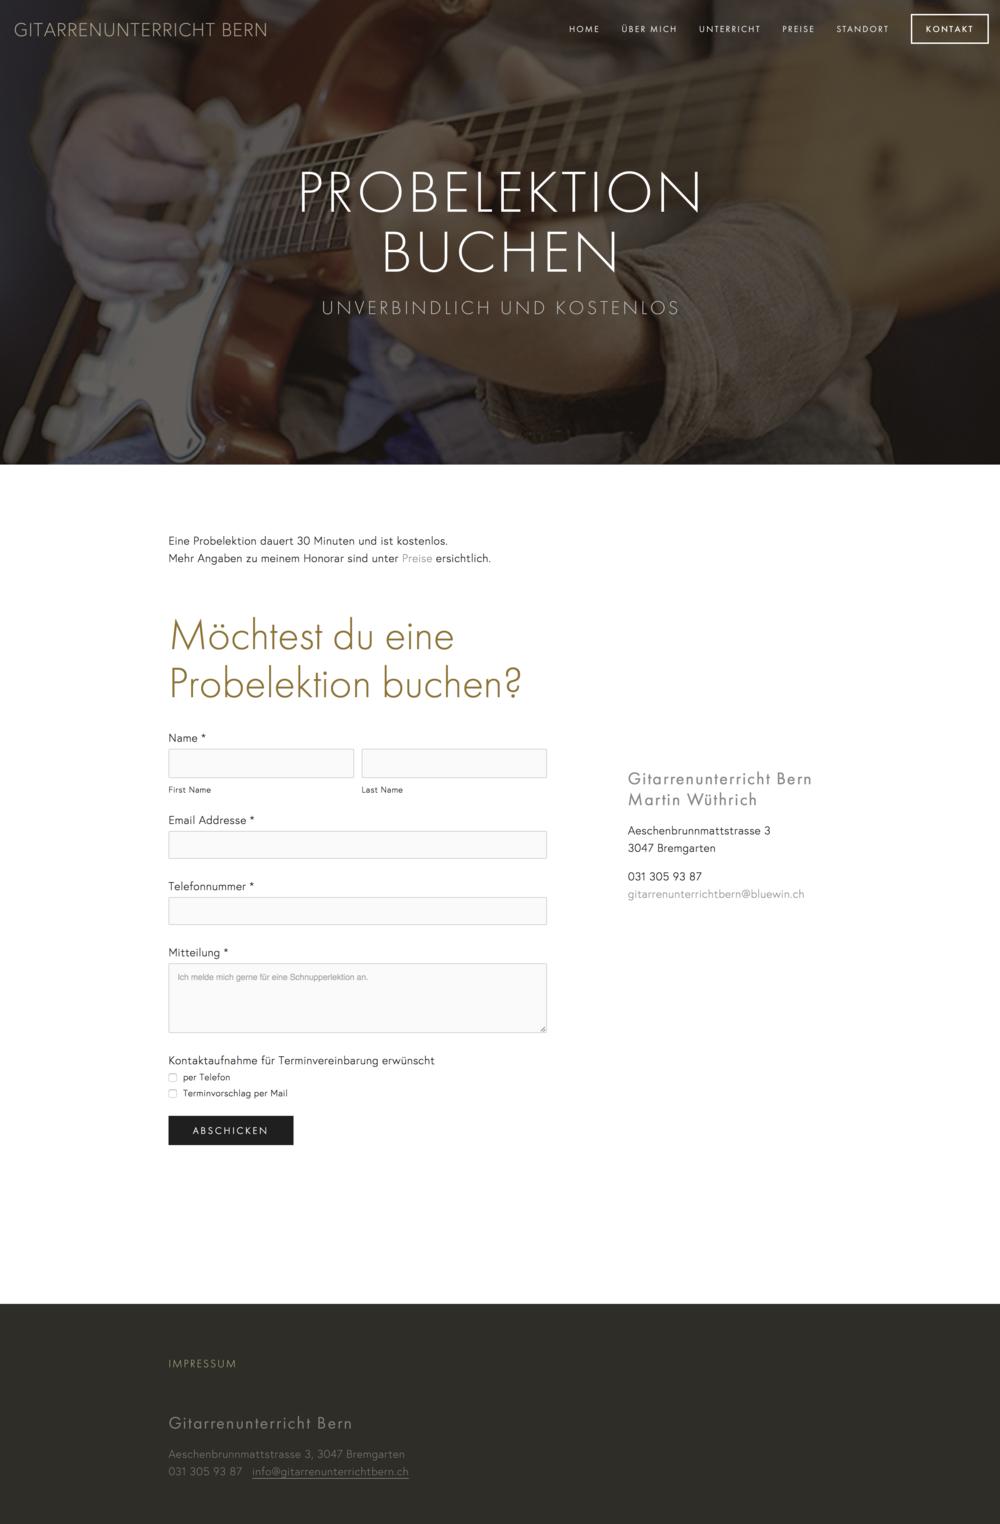 gitarrenunterricht_form.png